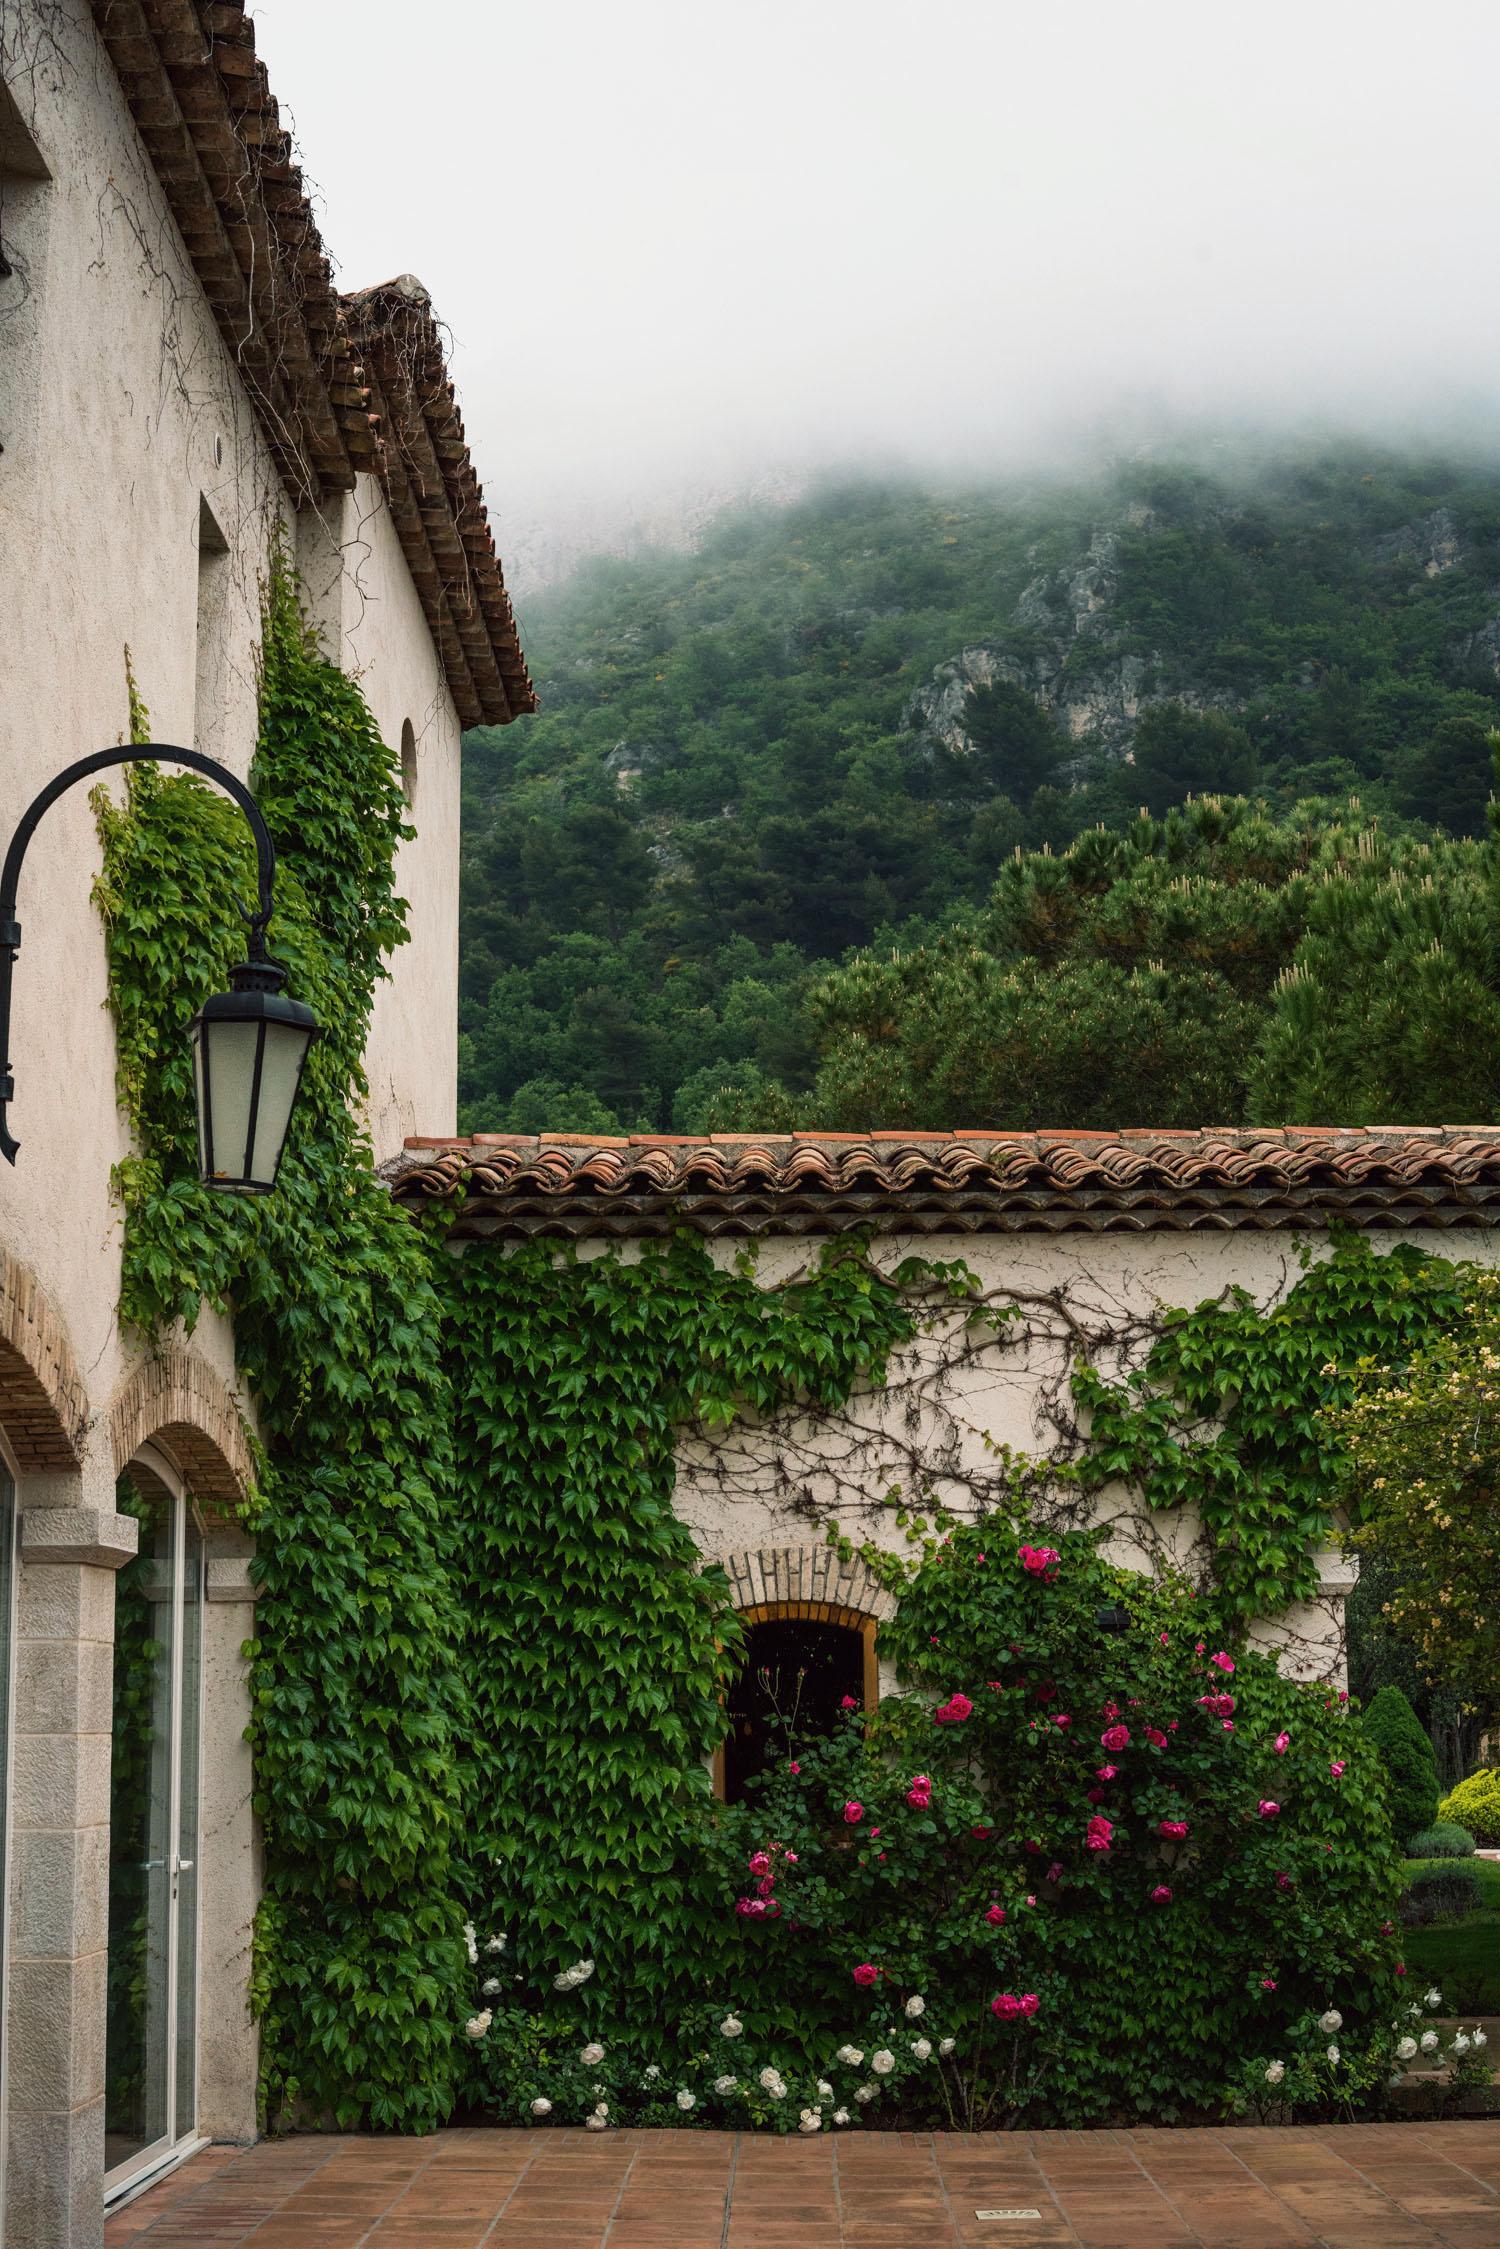 Chateau_Saint_Martin_13